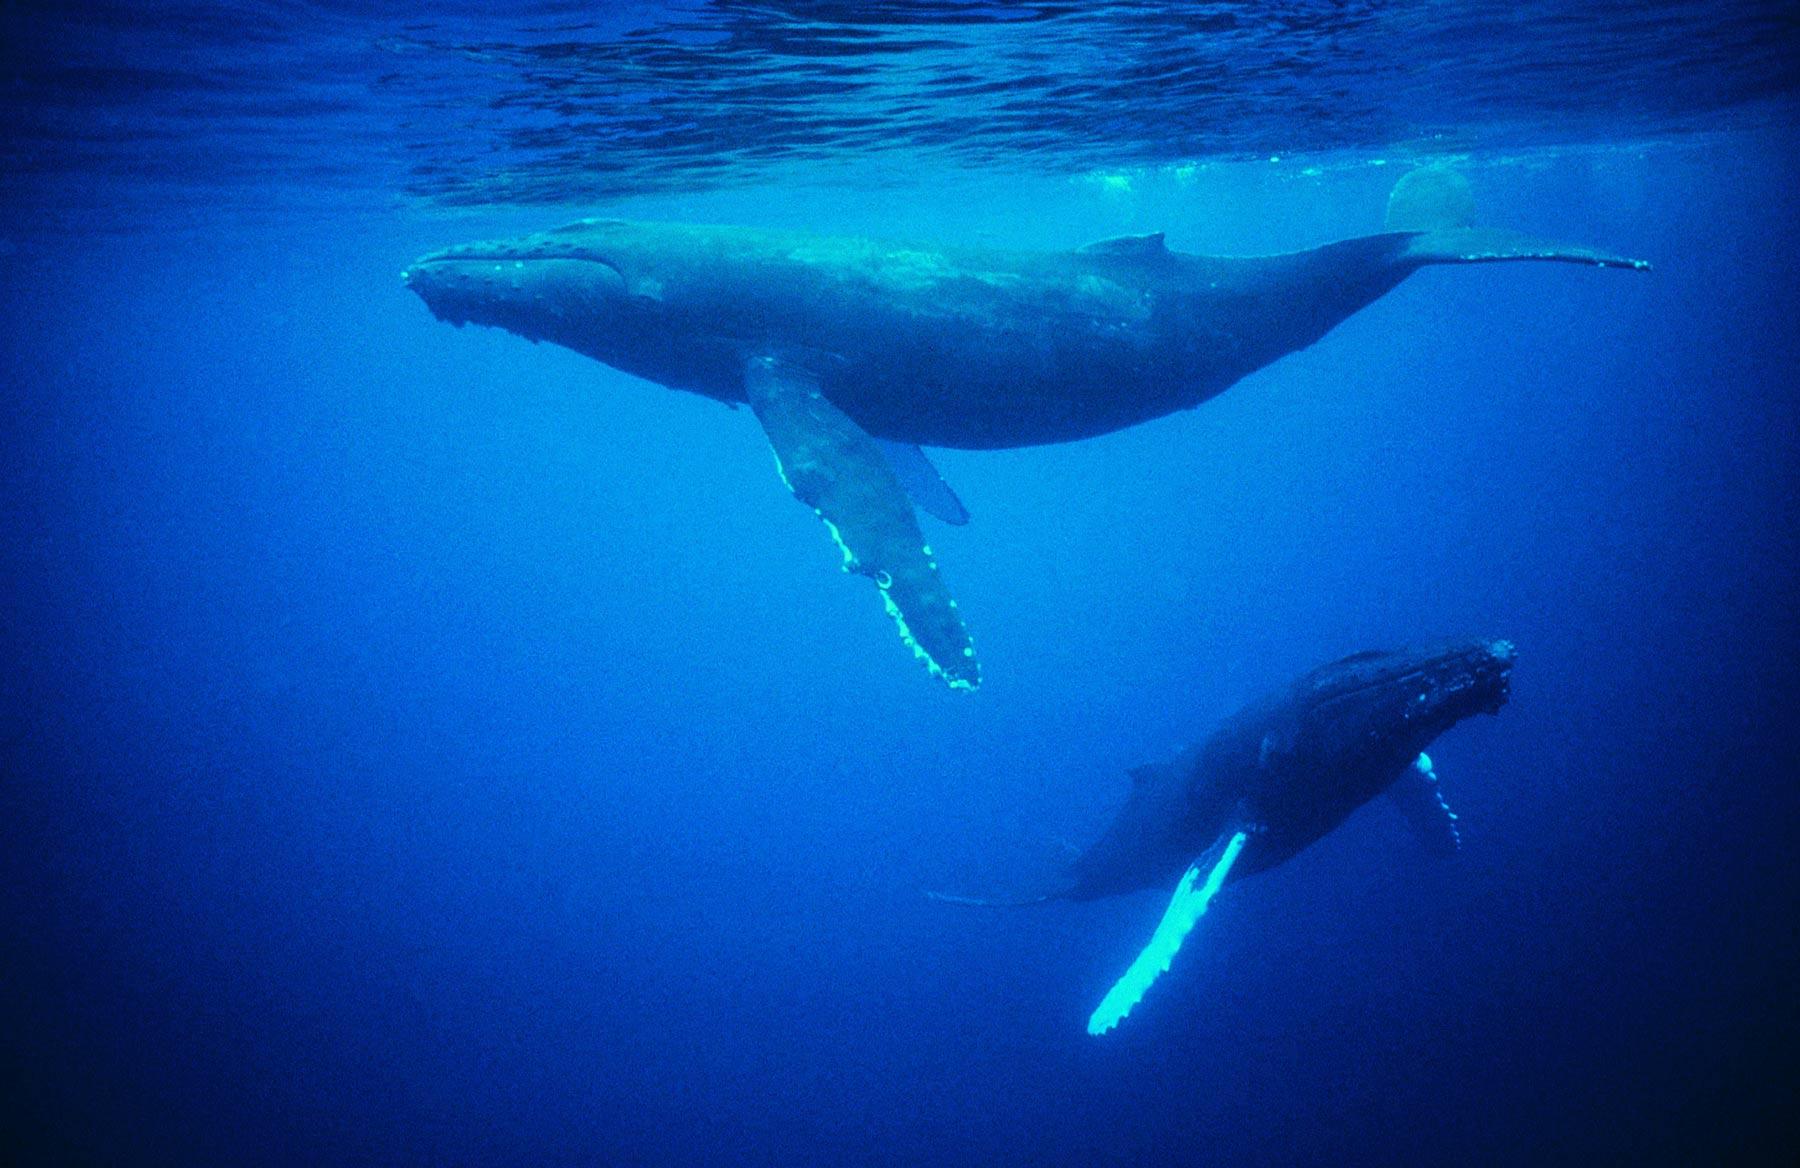 Whales under water